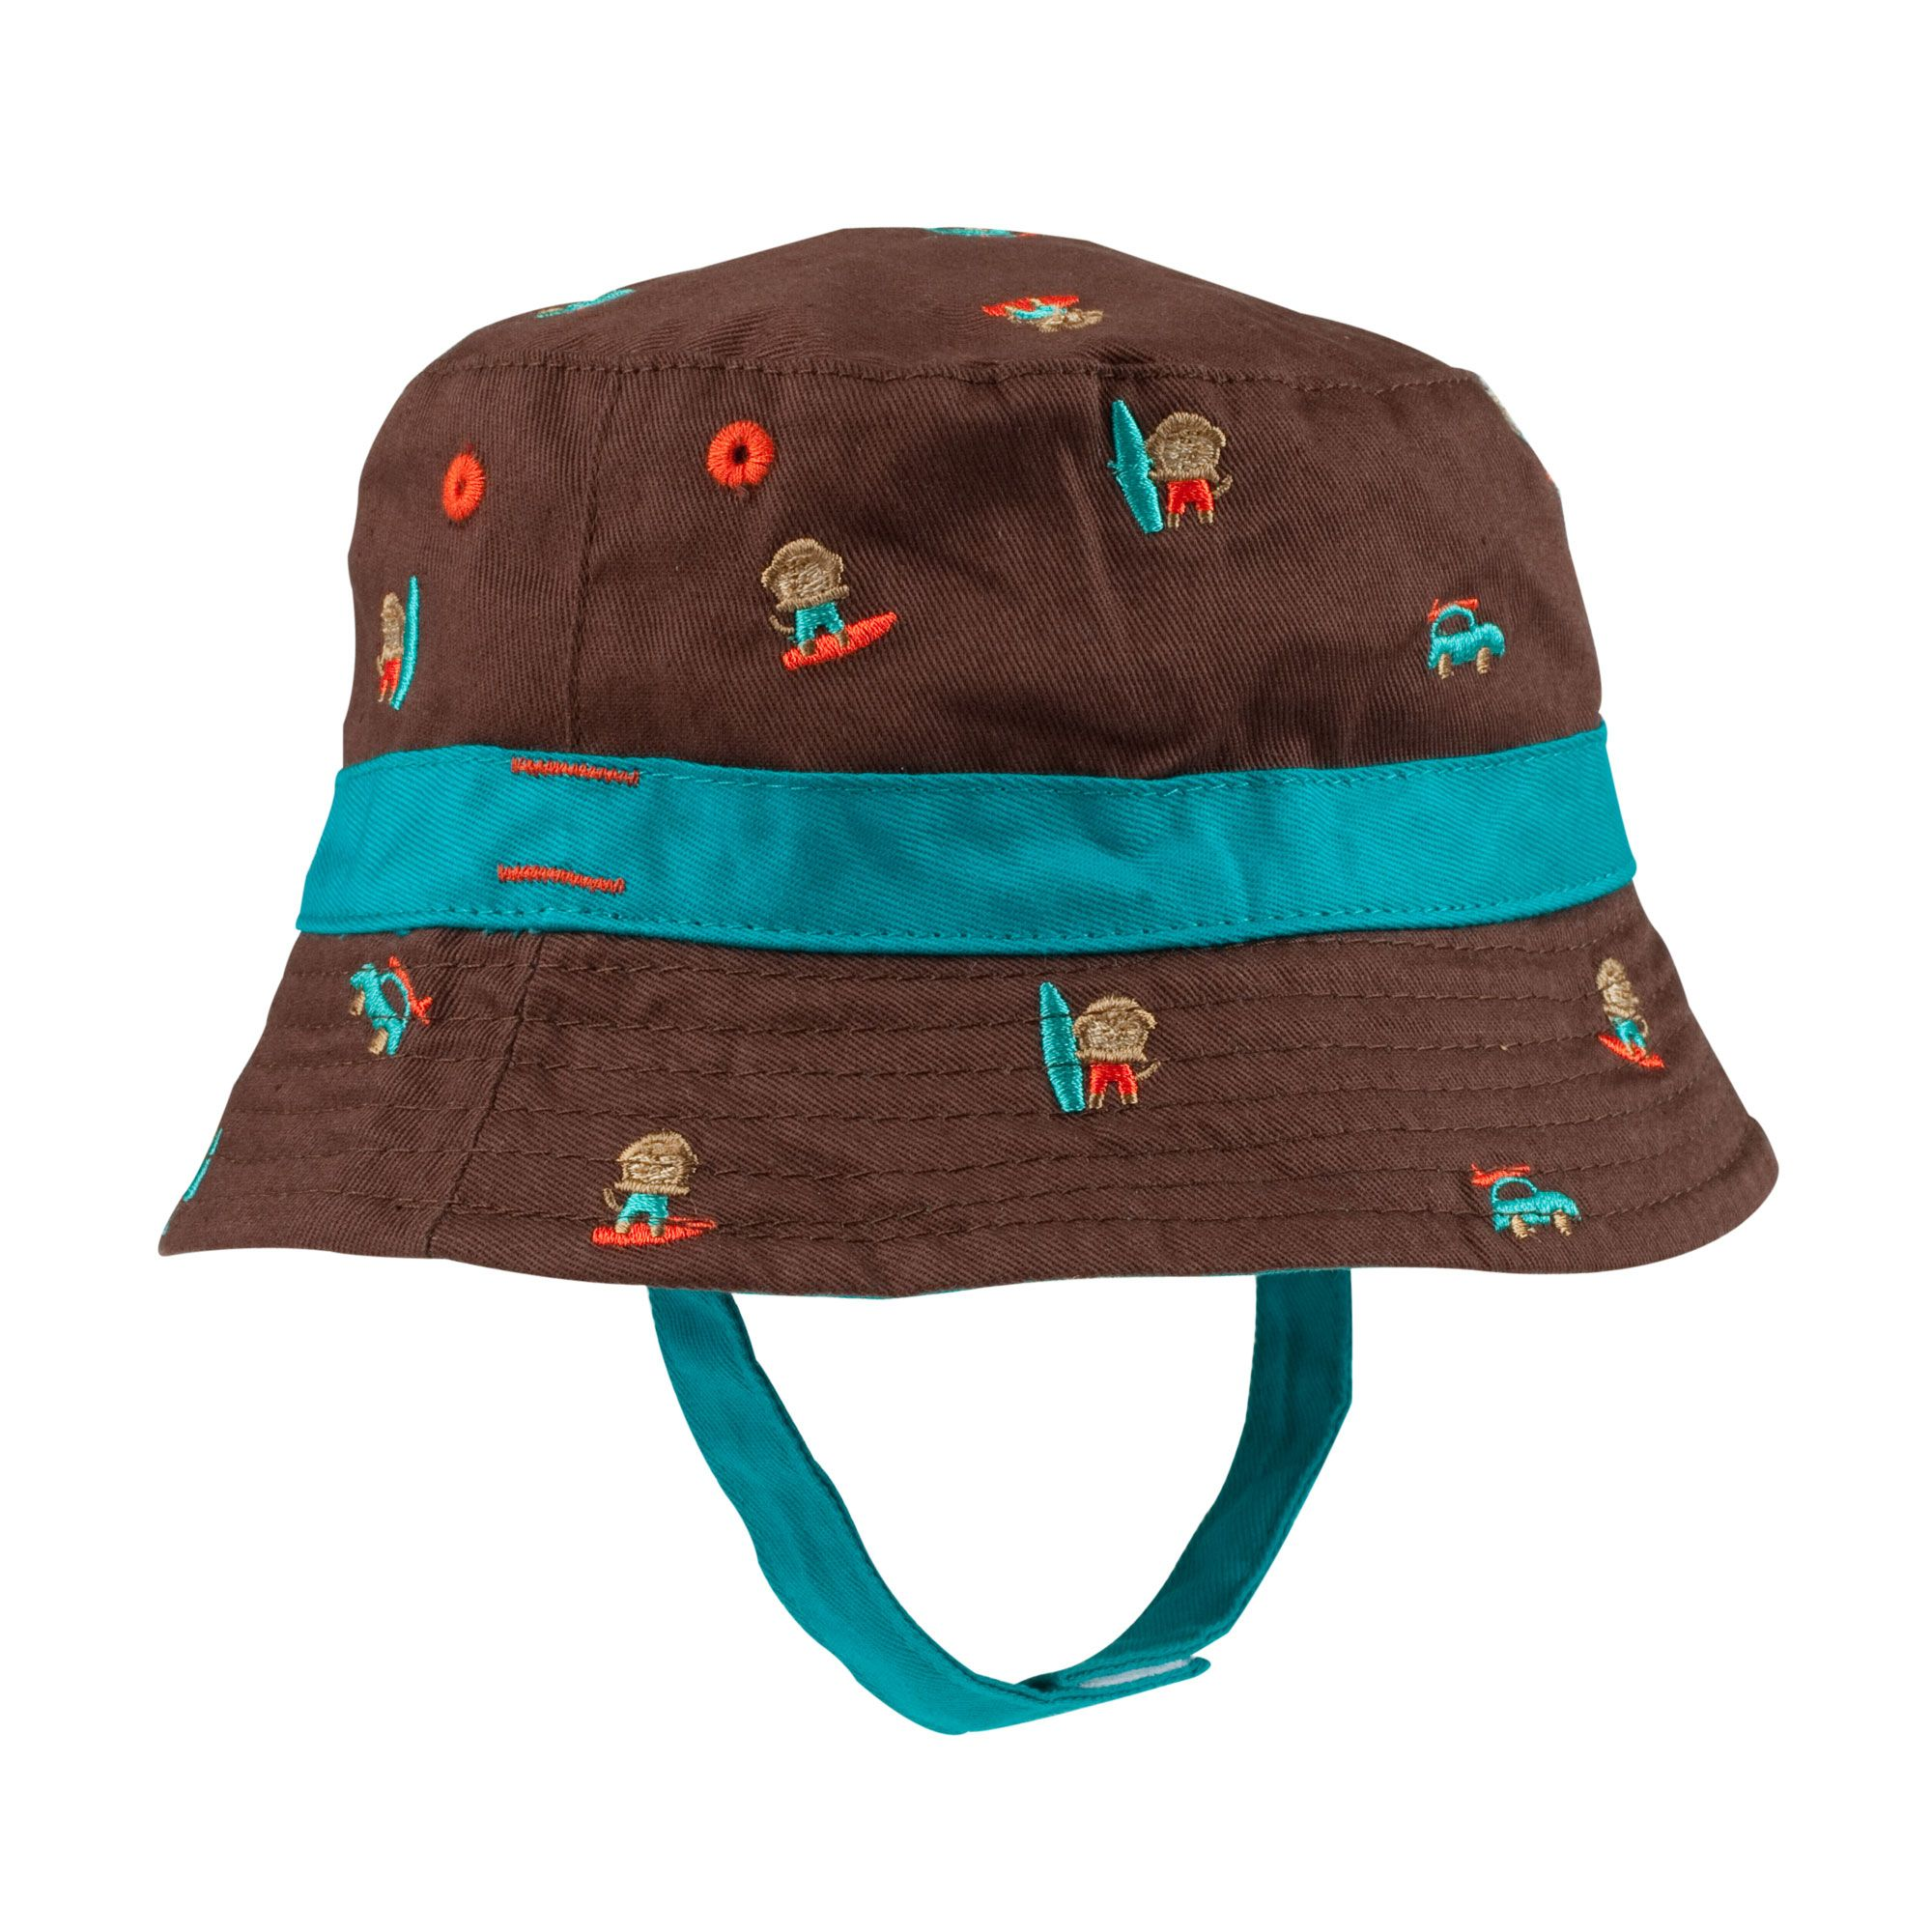 a7988afb006 Carters Monkey Surfer Twill Bucket Hat  18